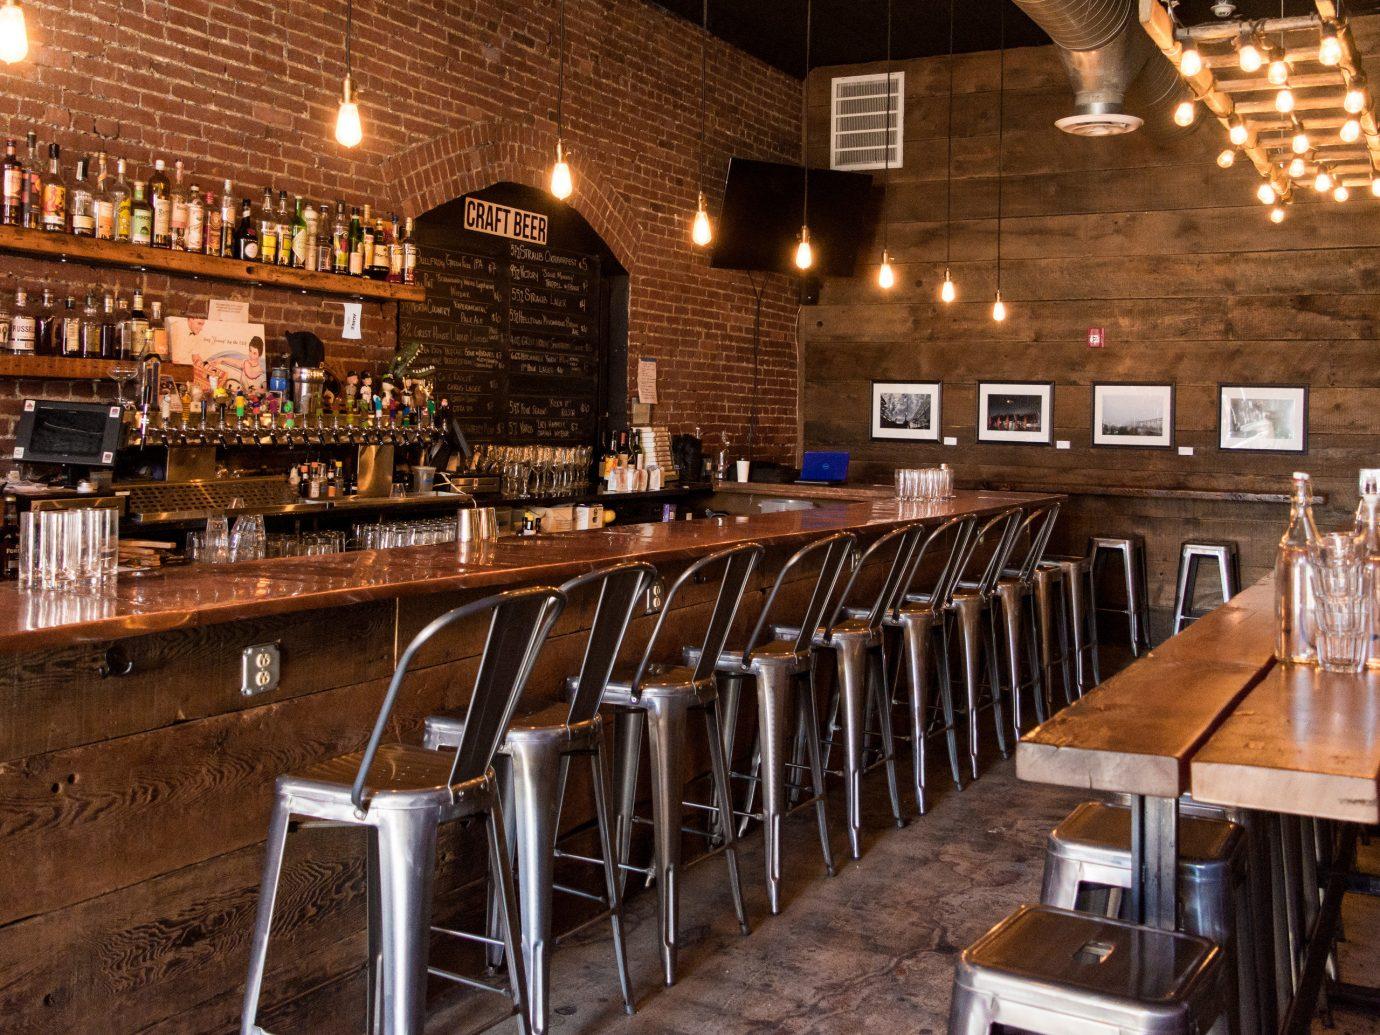 Road Trips Trip Ideas indoor Bar restaurant ceiling tavern interior design several dining room